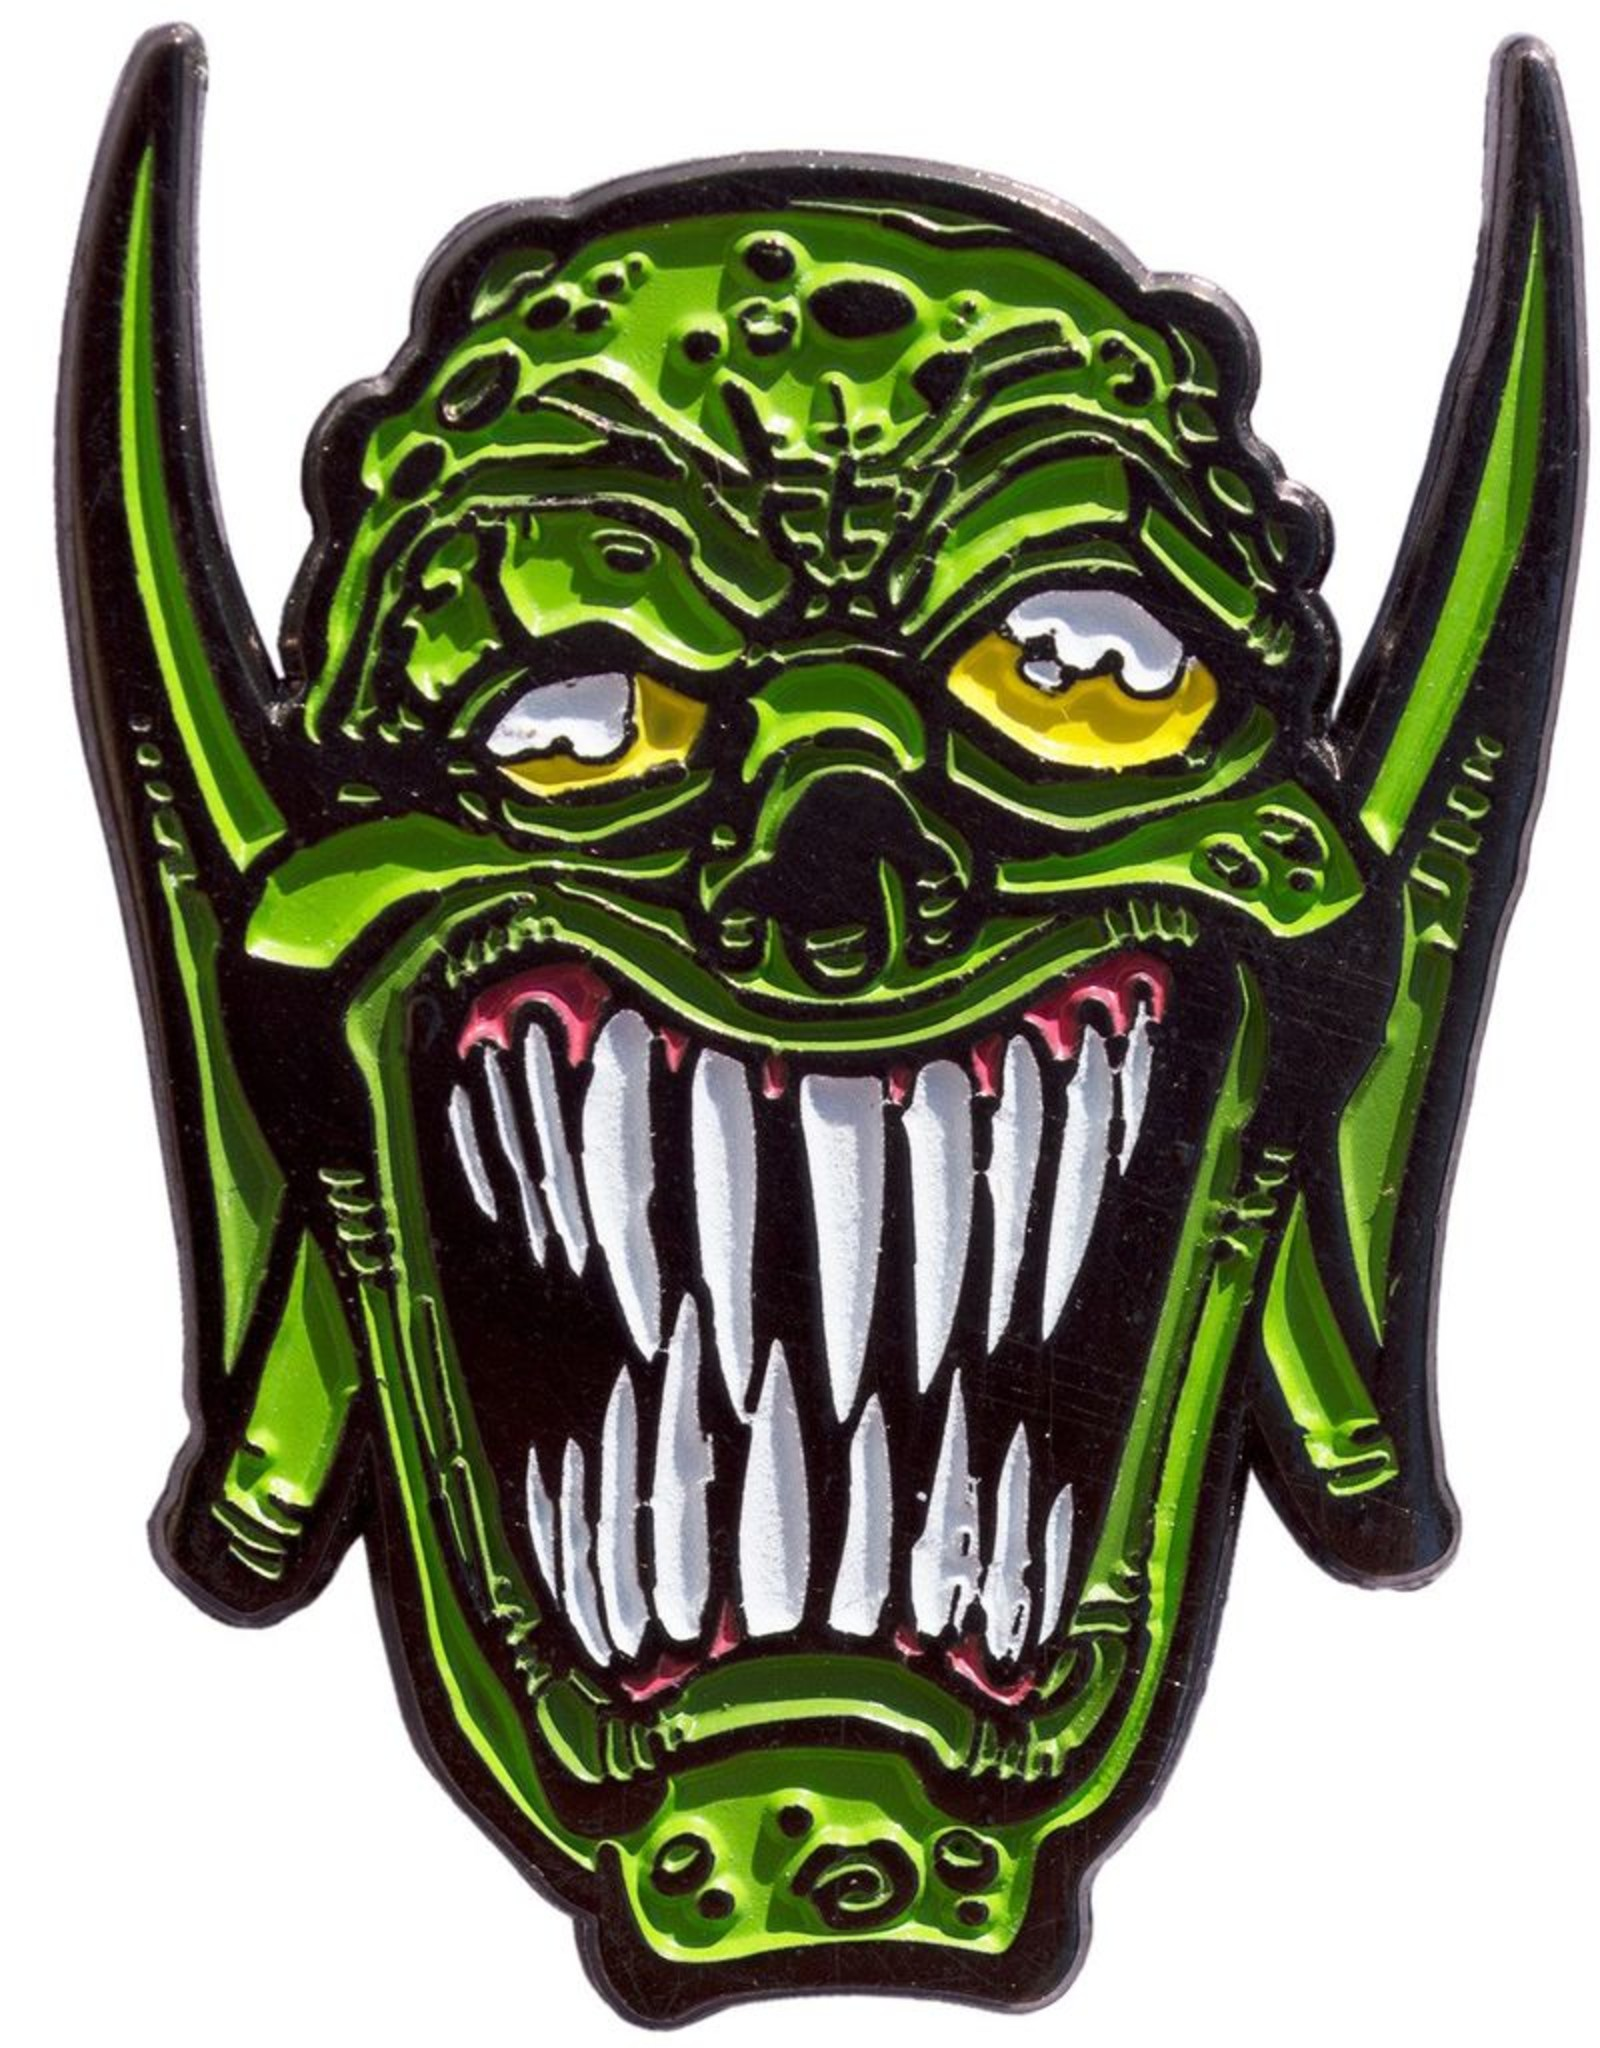 Goosebumps Haunted Mask Enamel Pin